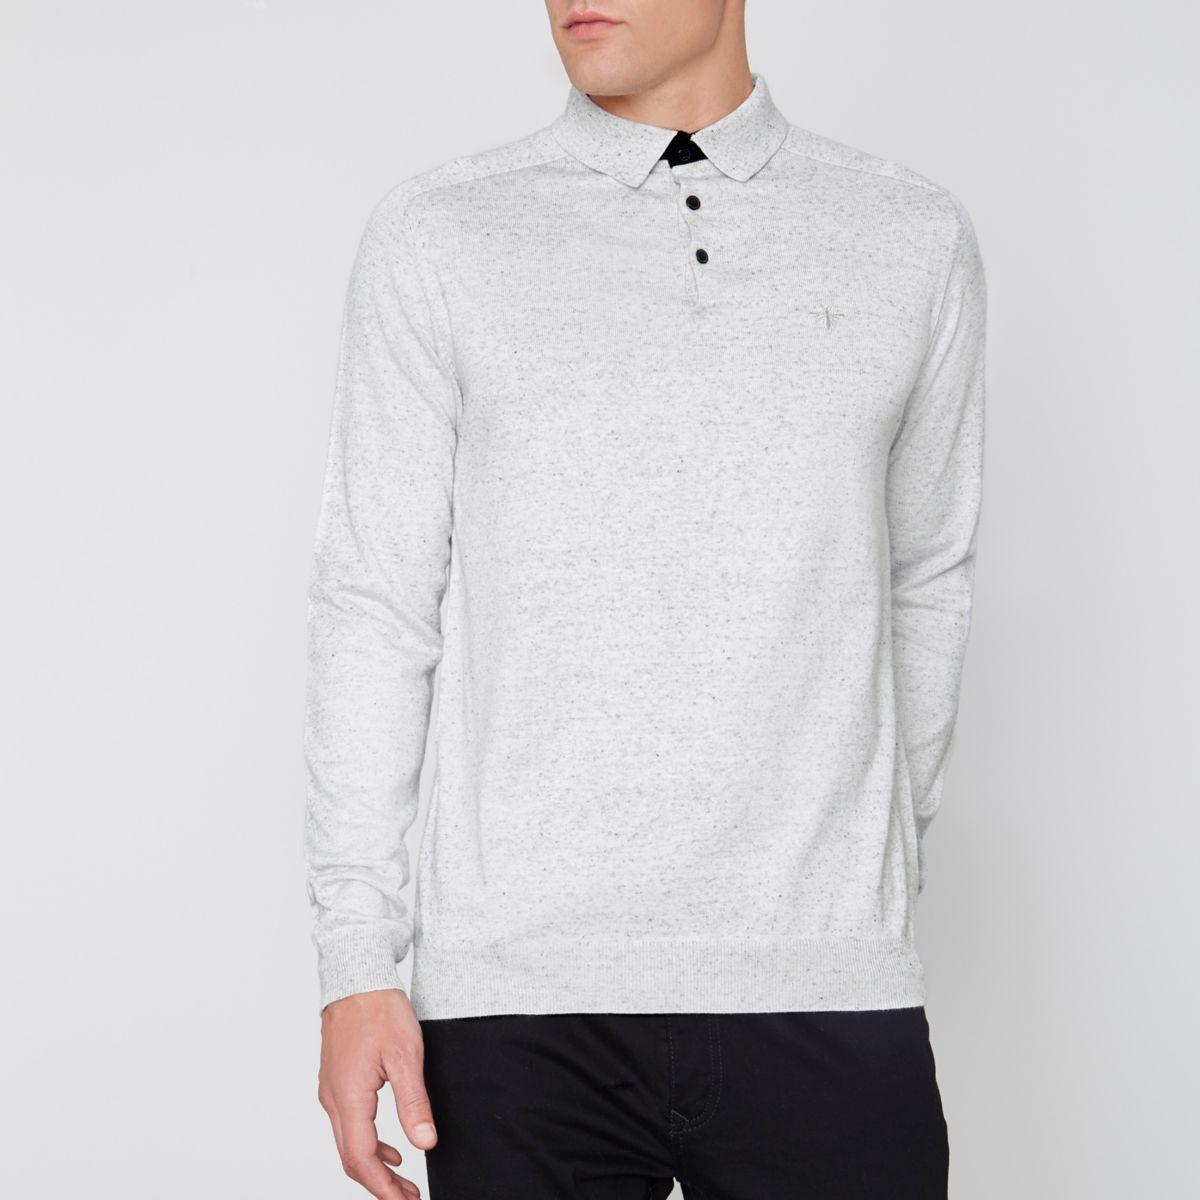 Light grey long sleeve knitted polo shirt